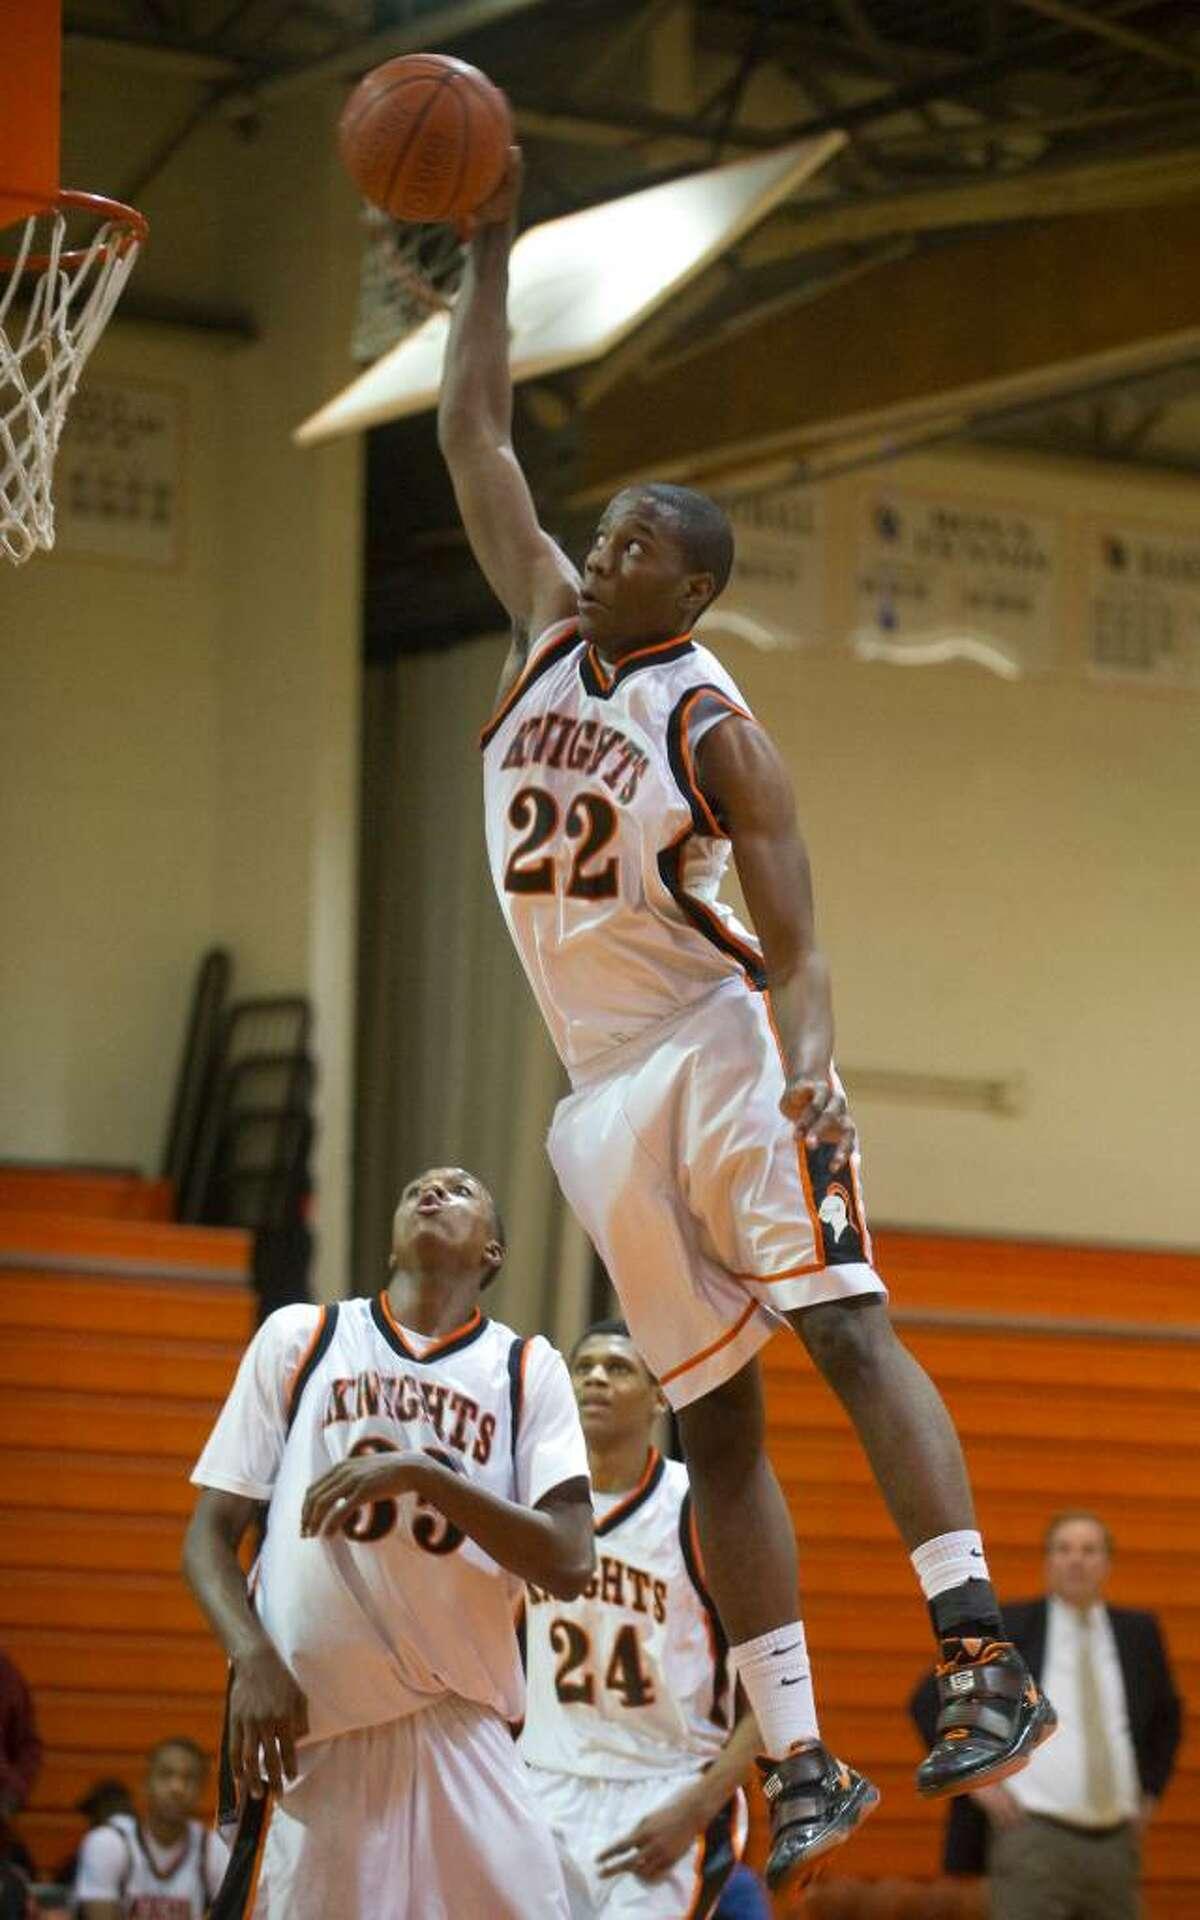 Stamford's Mark Ellis dunks during an FCIAC boys basketball game at Stamford High School in Stamford, Conn. on Tuesday, Feb. 2, 2010. Staples High School defeated Stamford High School 76-70 in overtime.